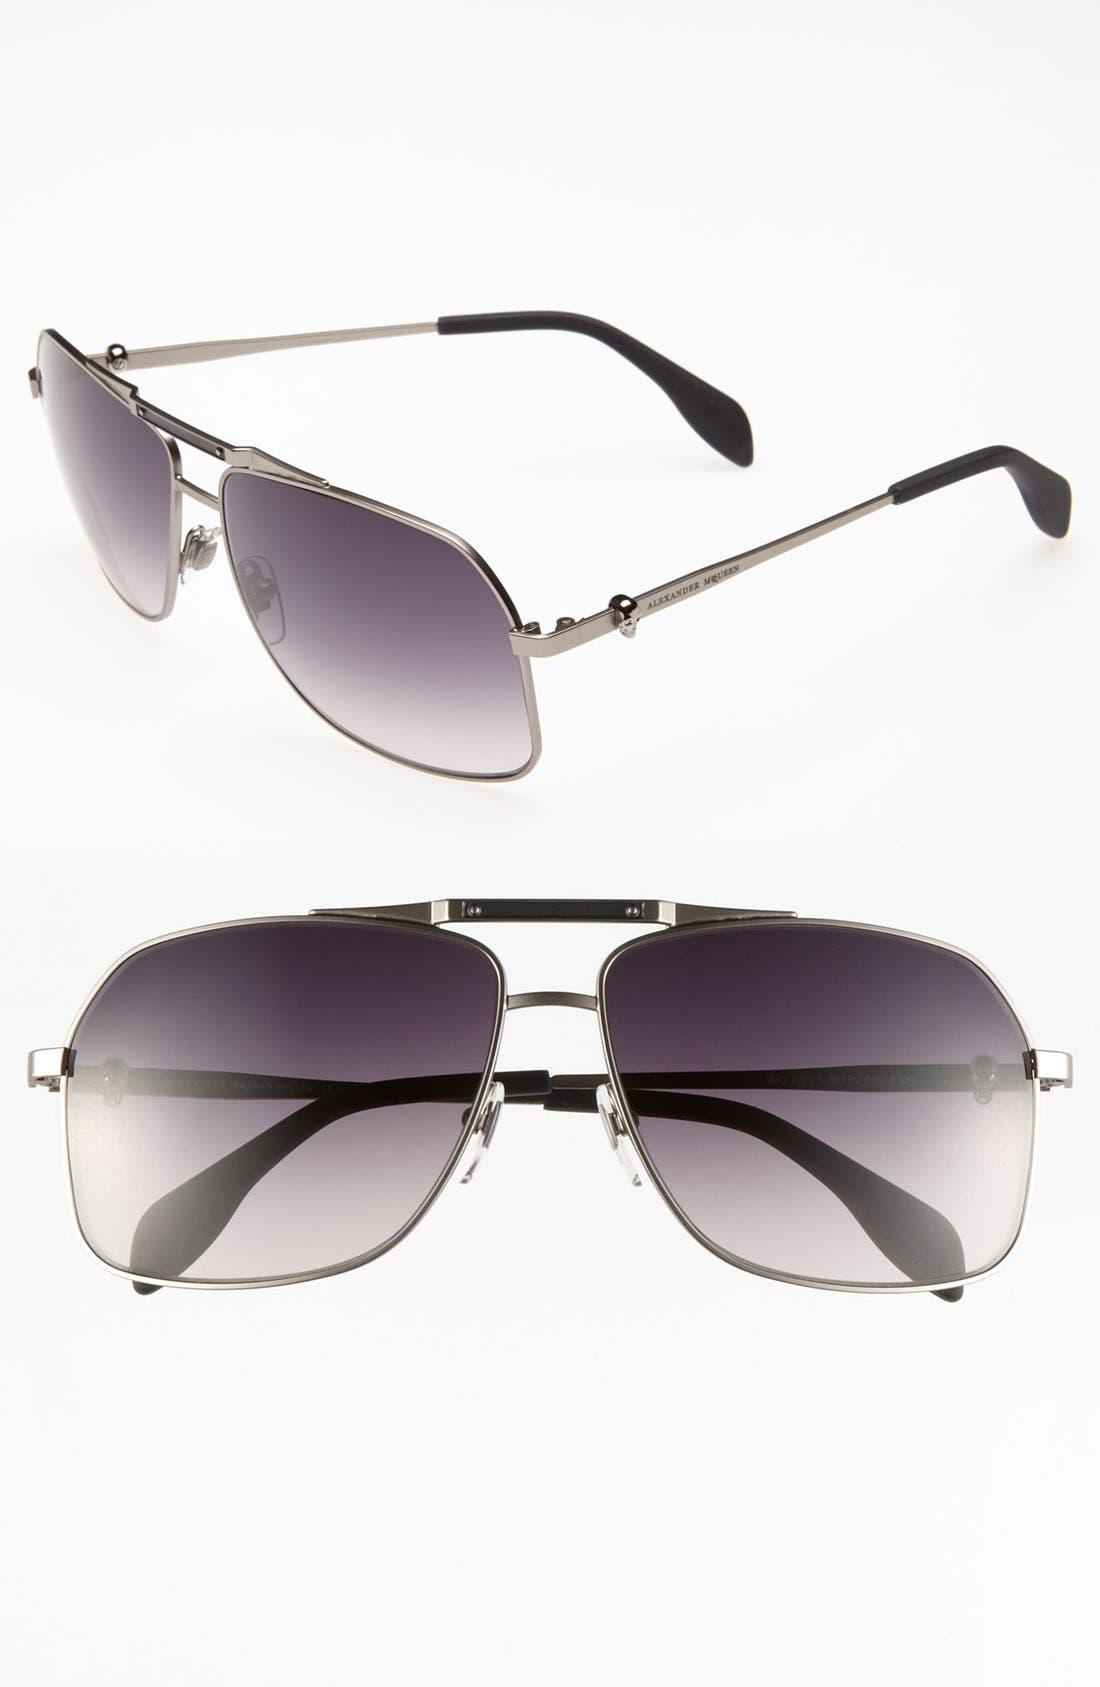 Main Image - Alexander McQueen 61mm Aviator Sunglasses (Online Only)